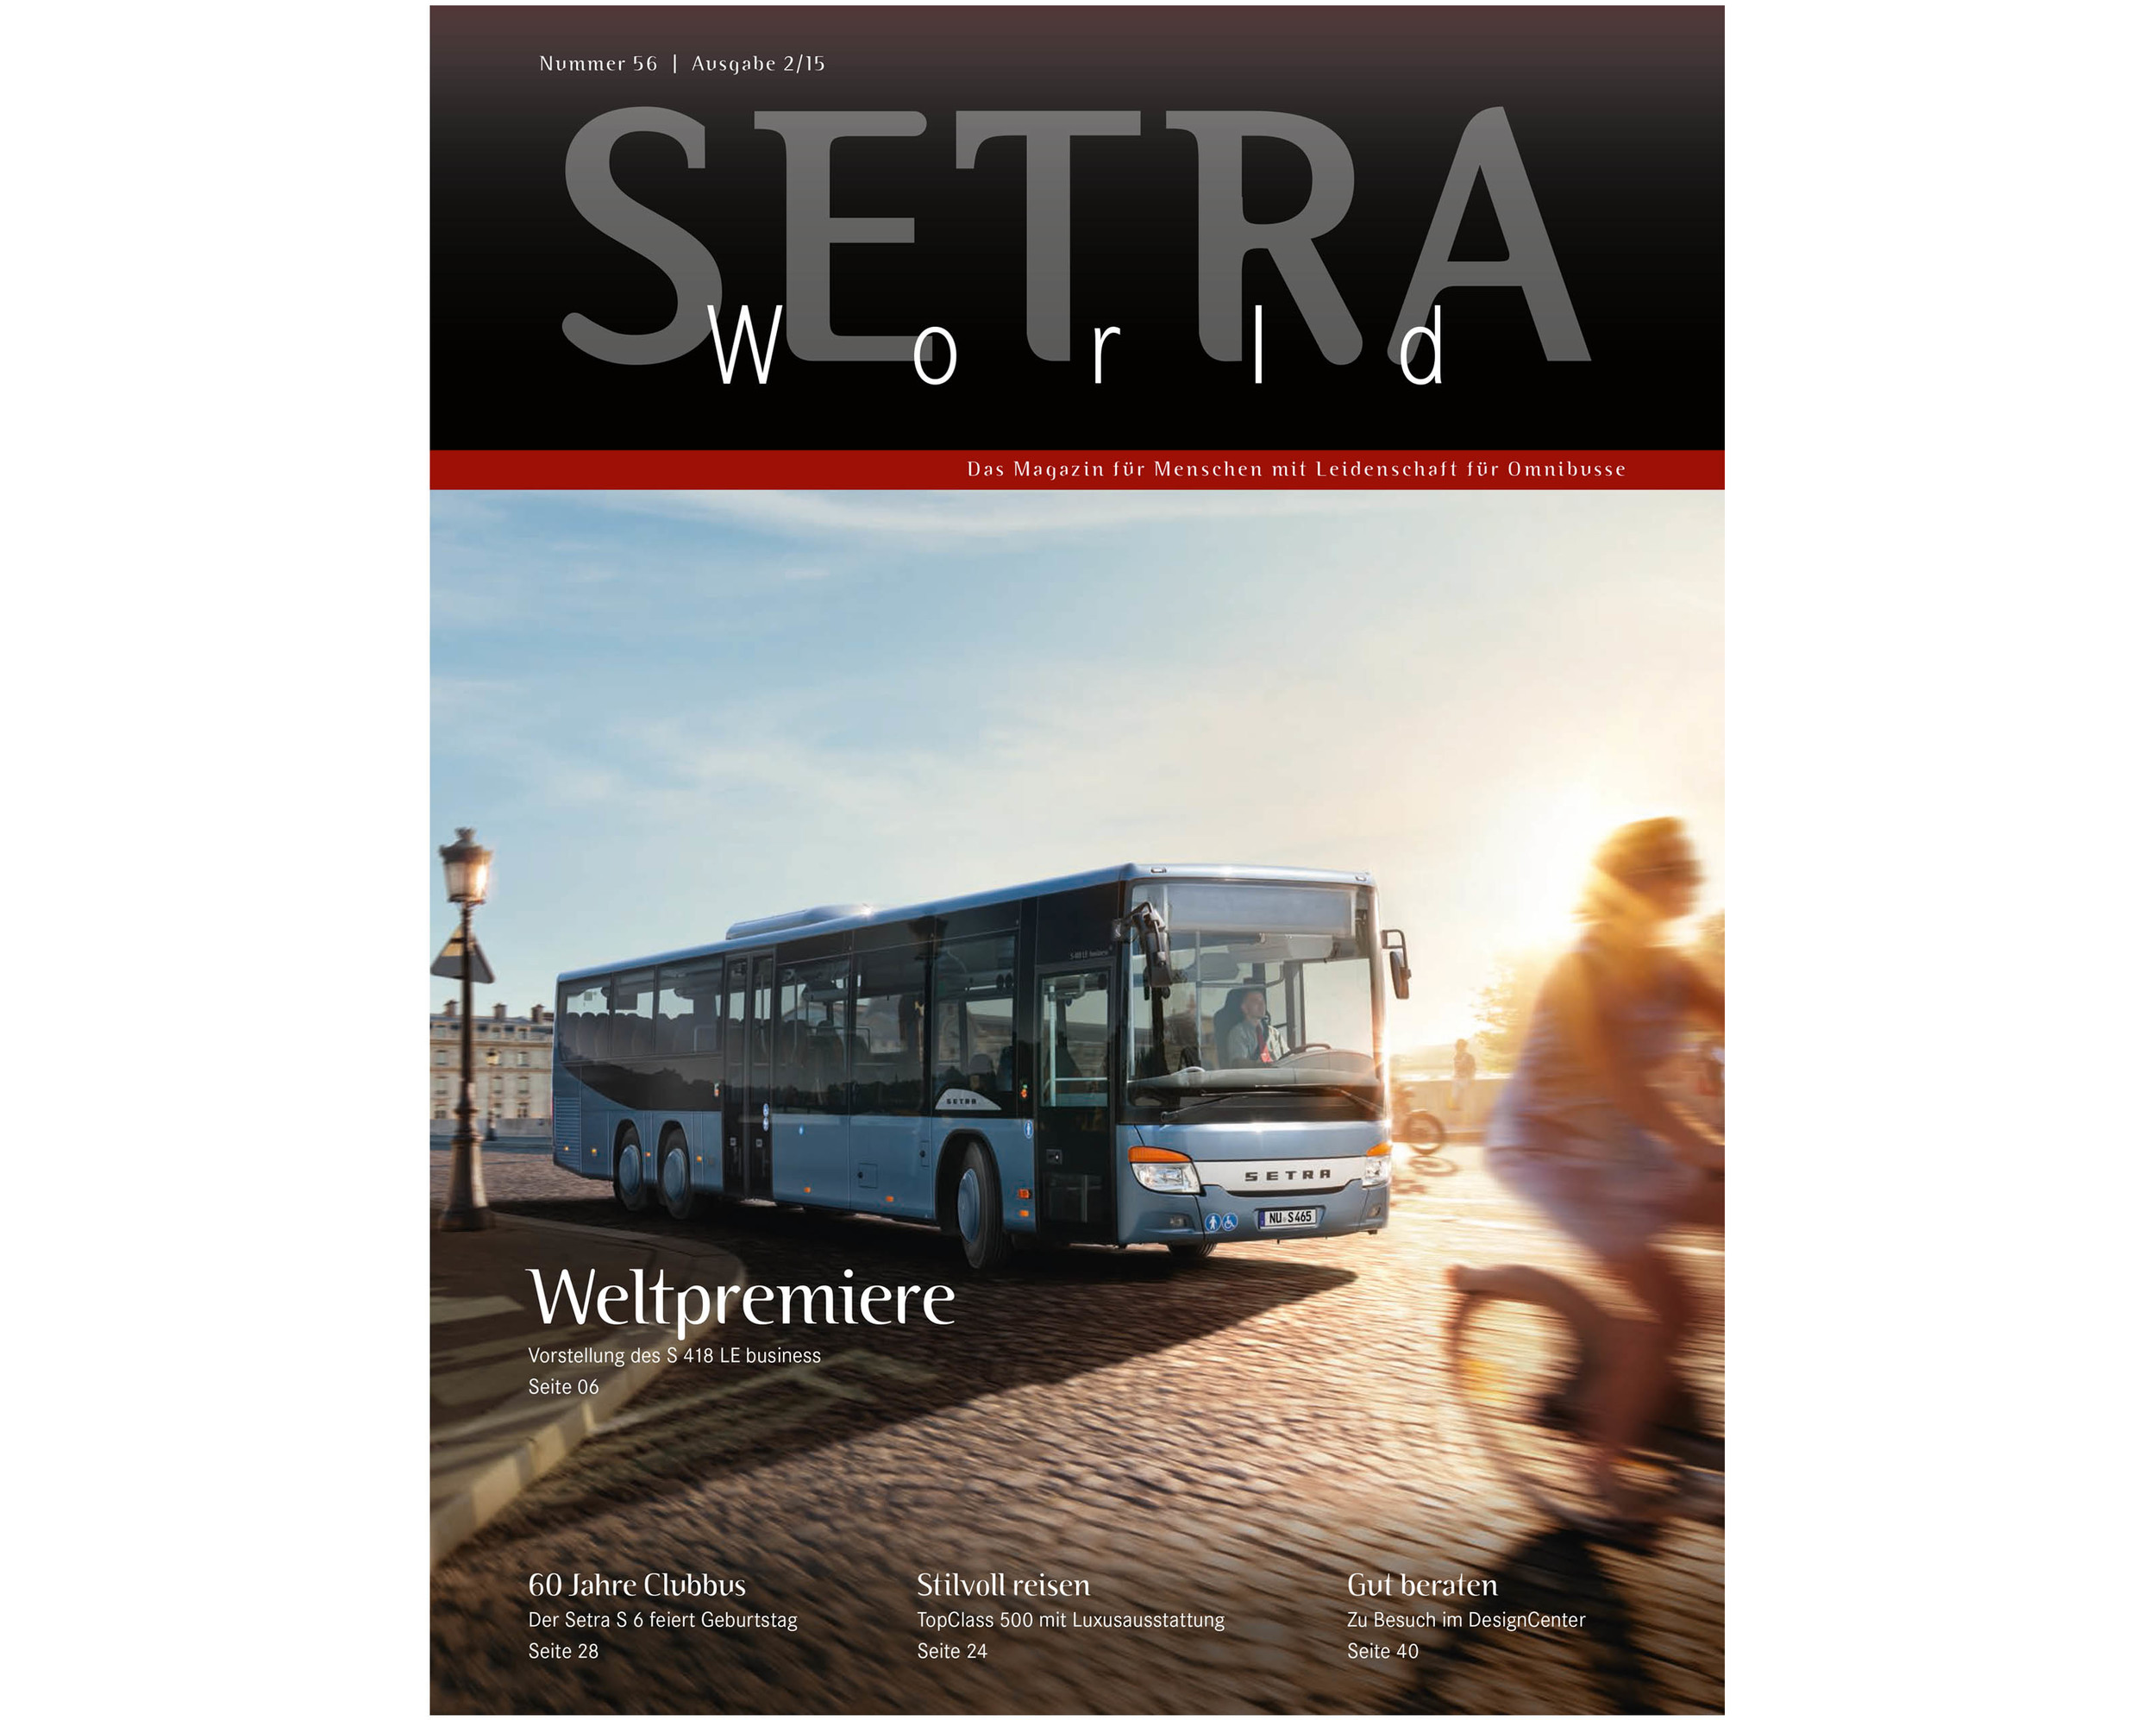 Setra_World_cover_04.jpg